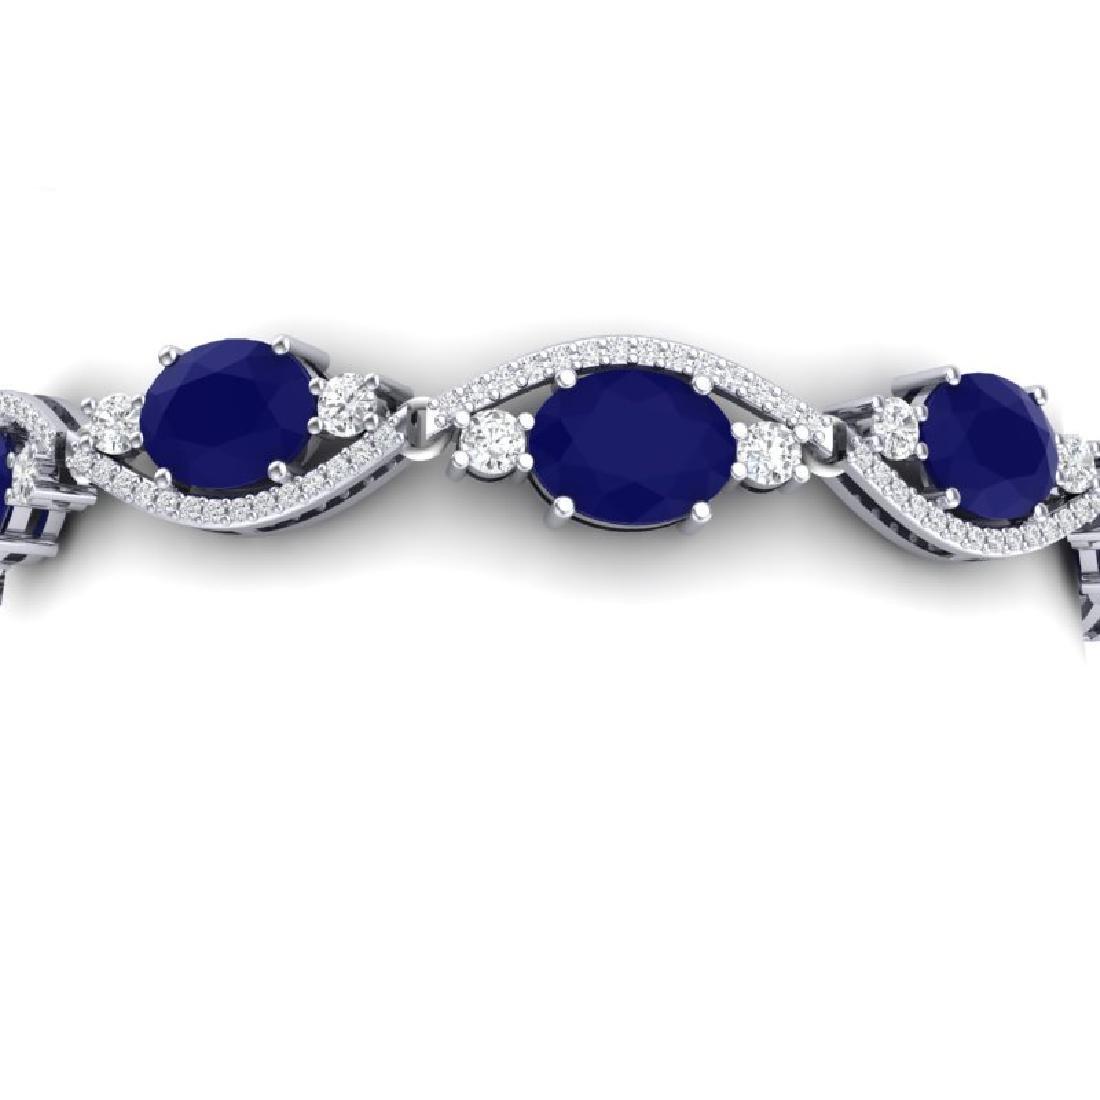 22.15 CTW Royalty Sapphire & VS Diamond Bracelet 18K